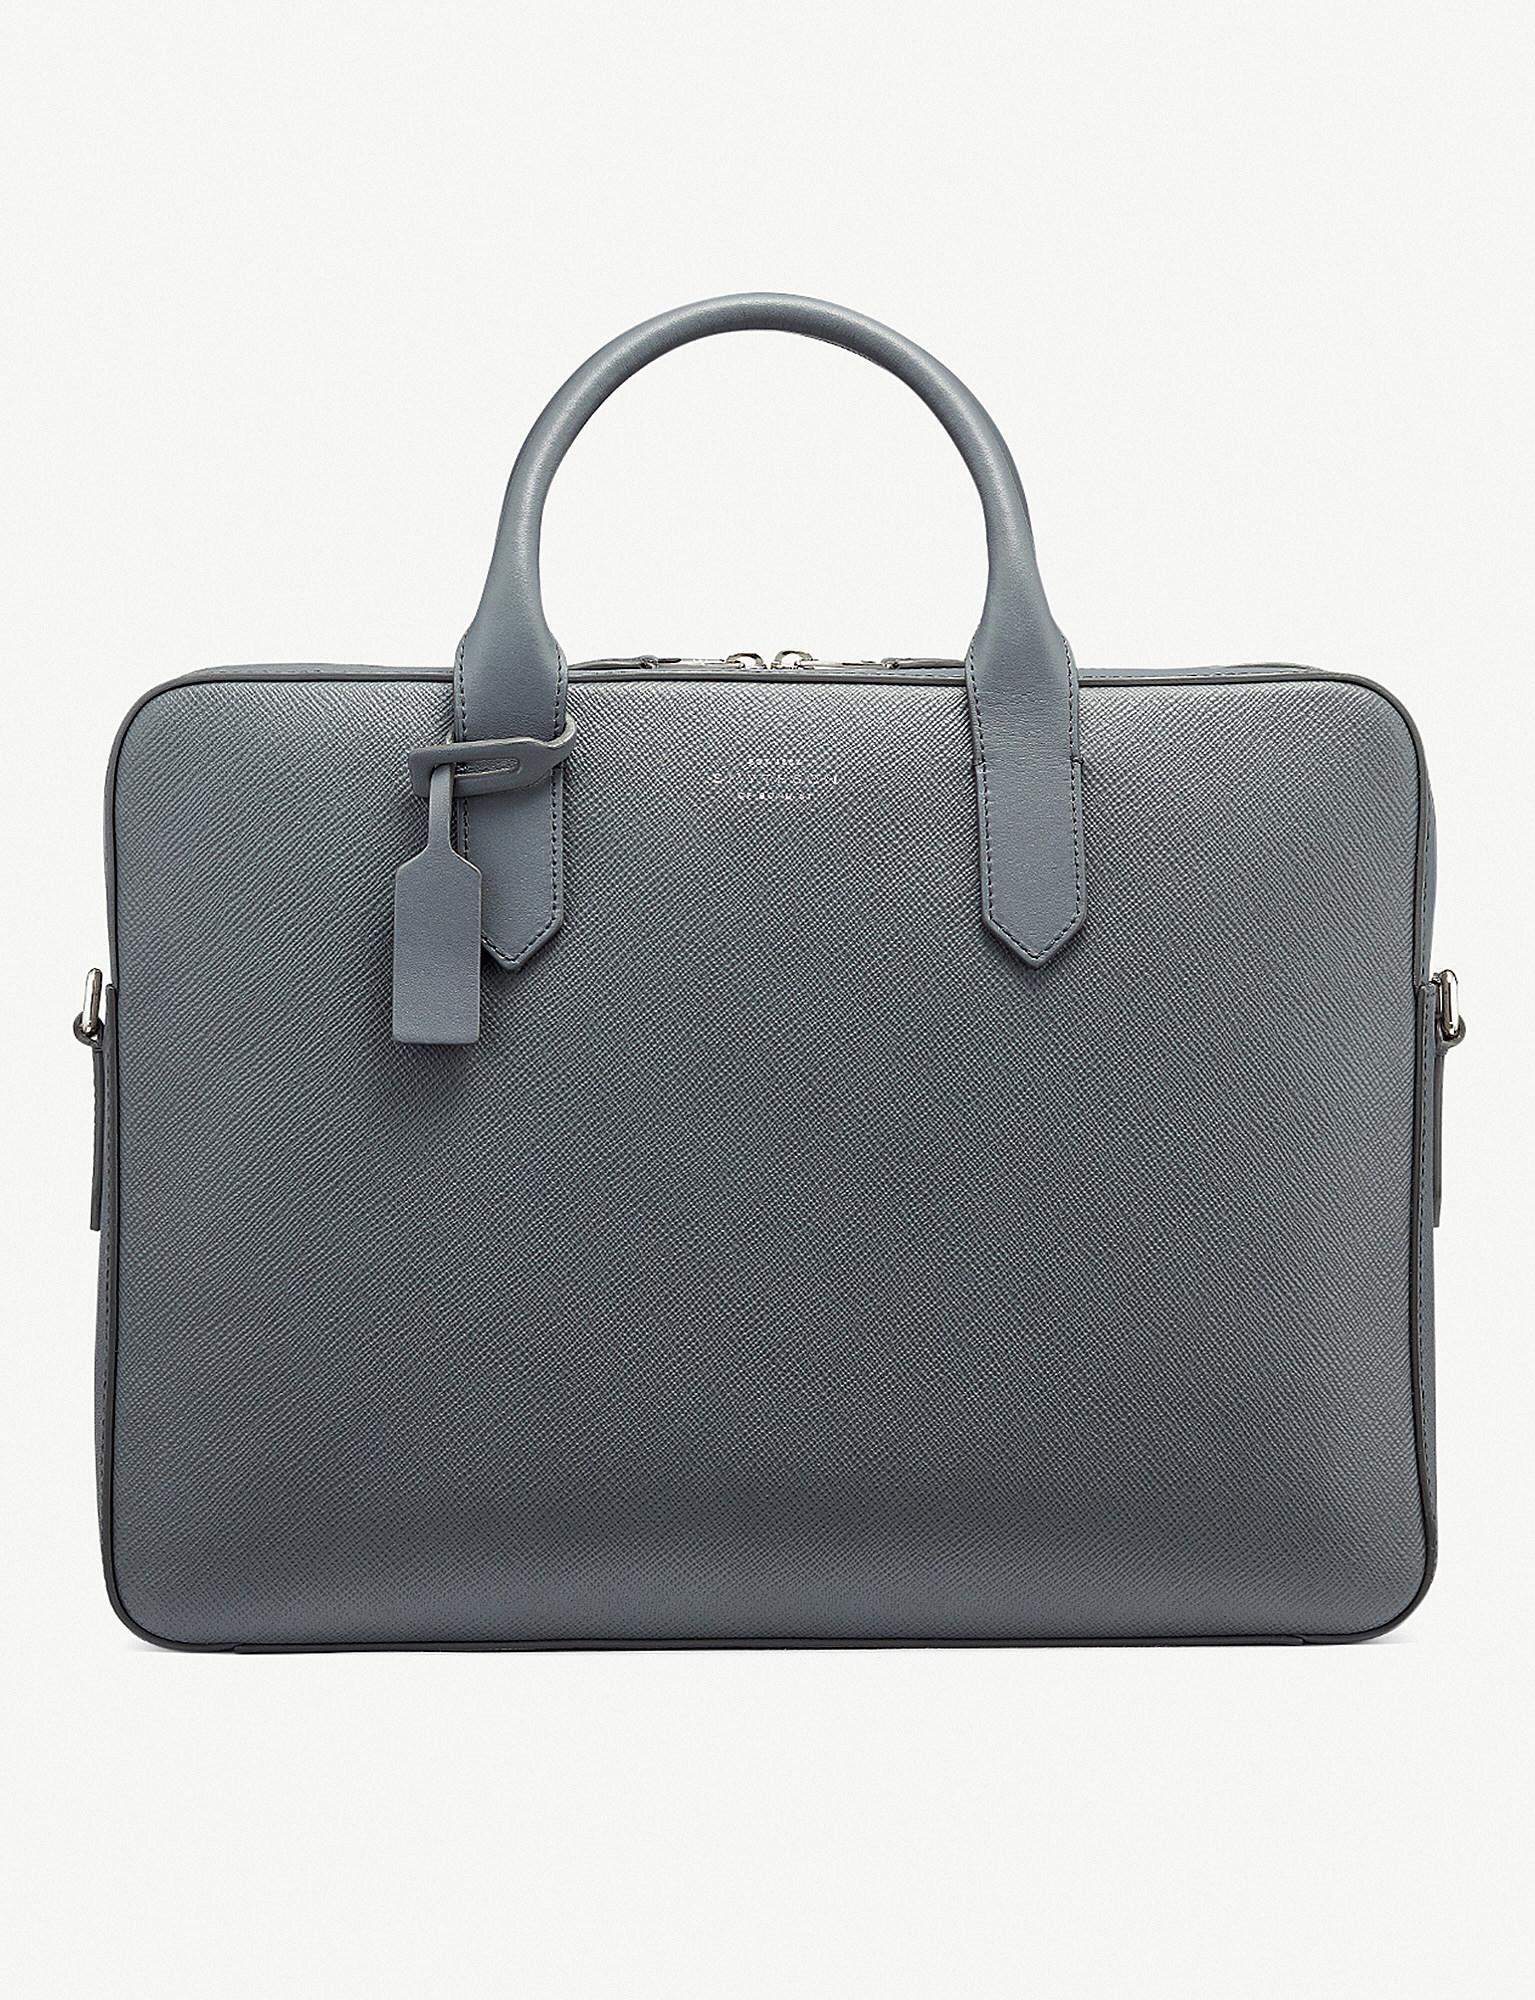 ee0a9b0fee Lyst - Smythson Panama Cross-grain Leather Slim Briefcase in Black